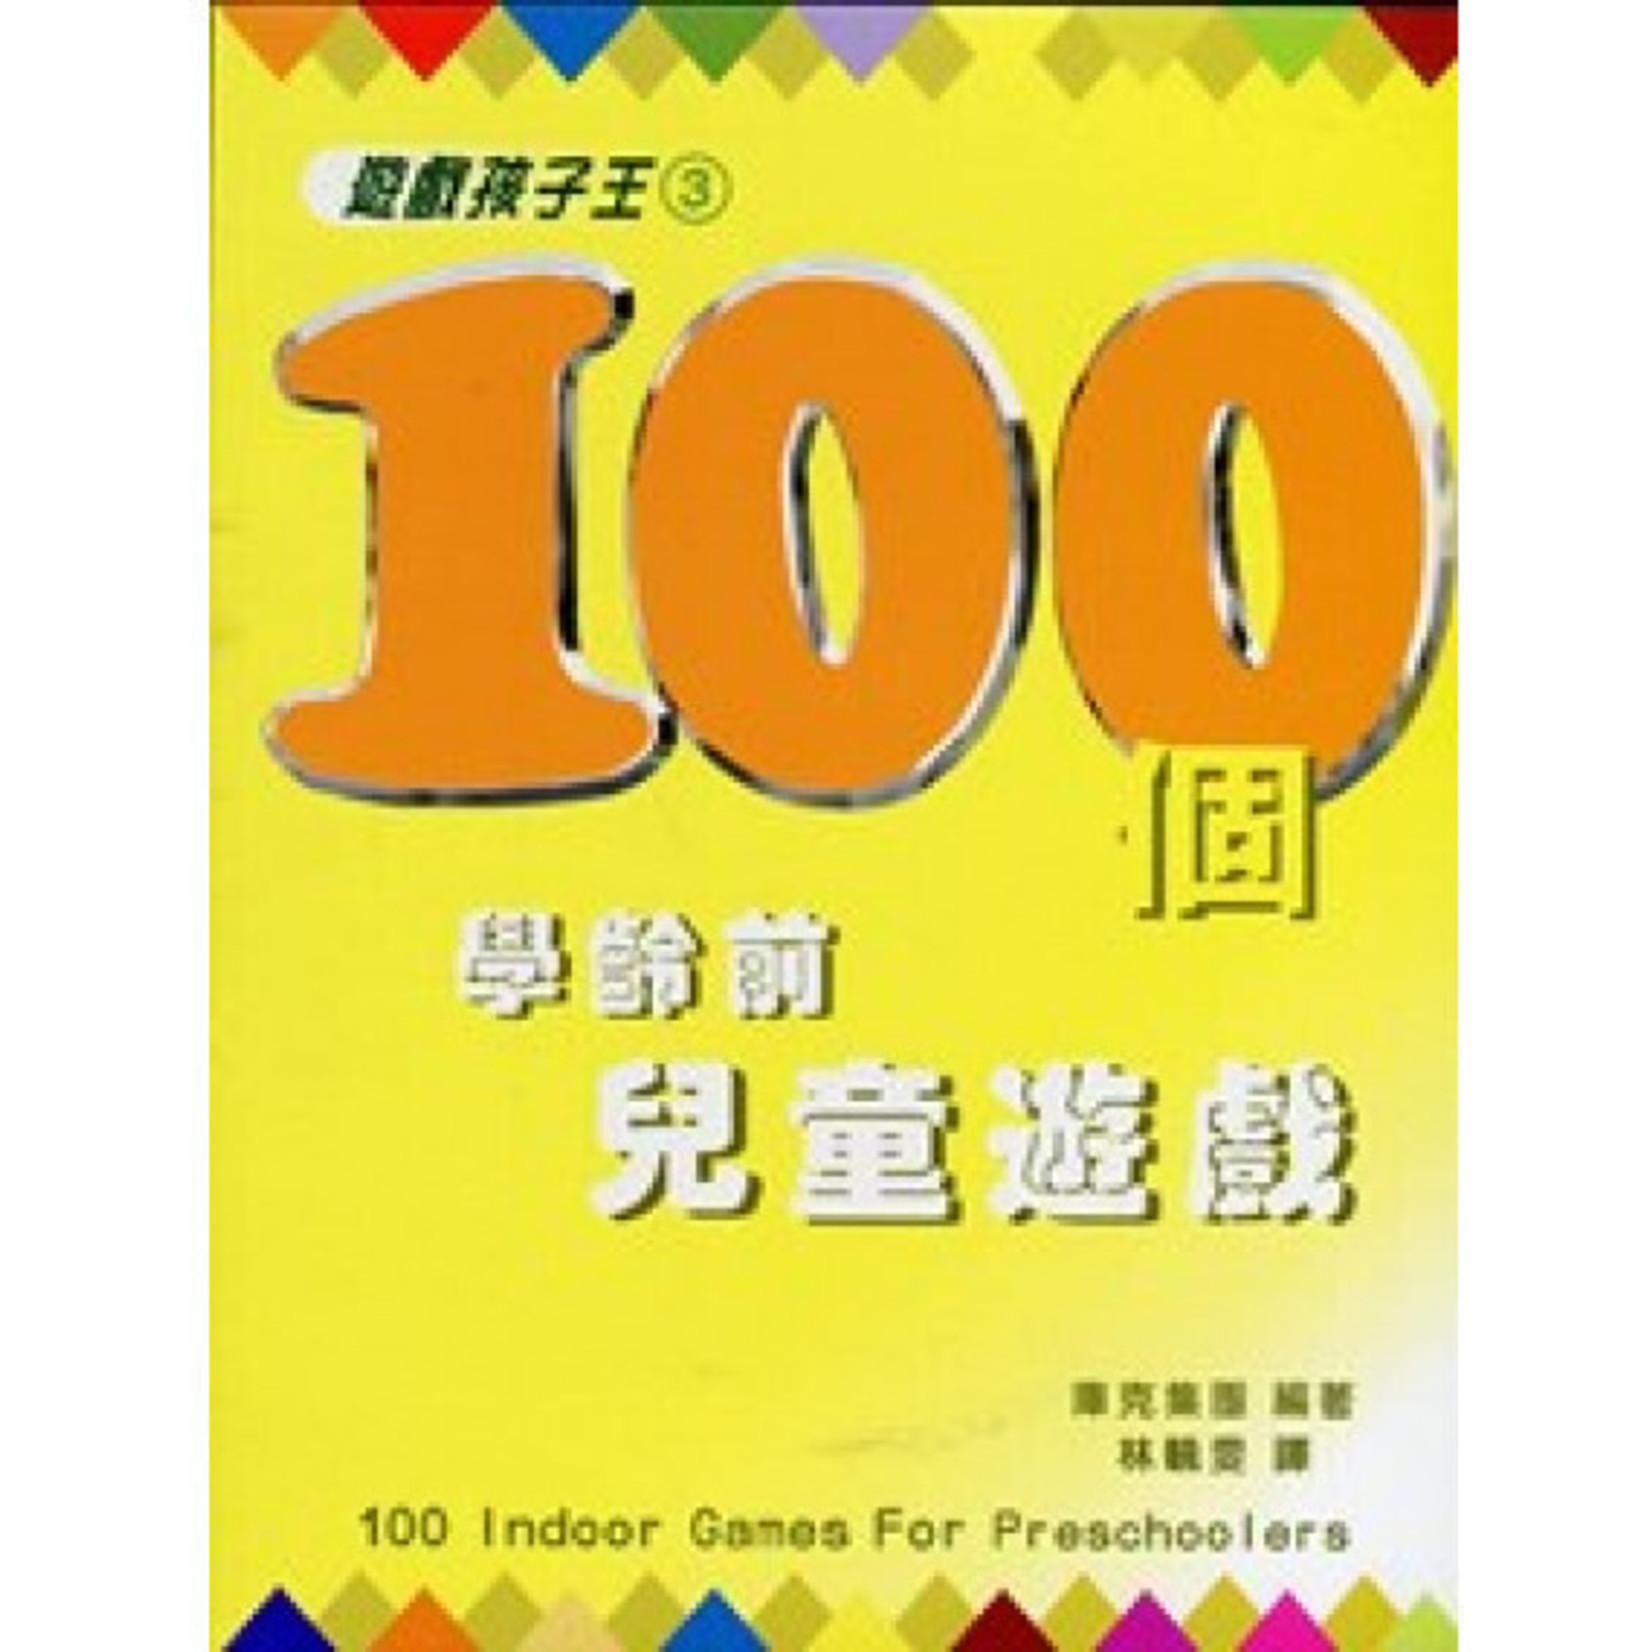 中國主日學協會 China Sunday School Association 遊戲孩子王3:100個學齡前兒童遊戲 100 Indoor Games for Preschoolers